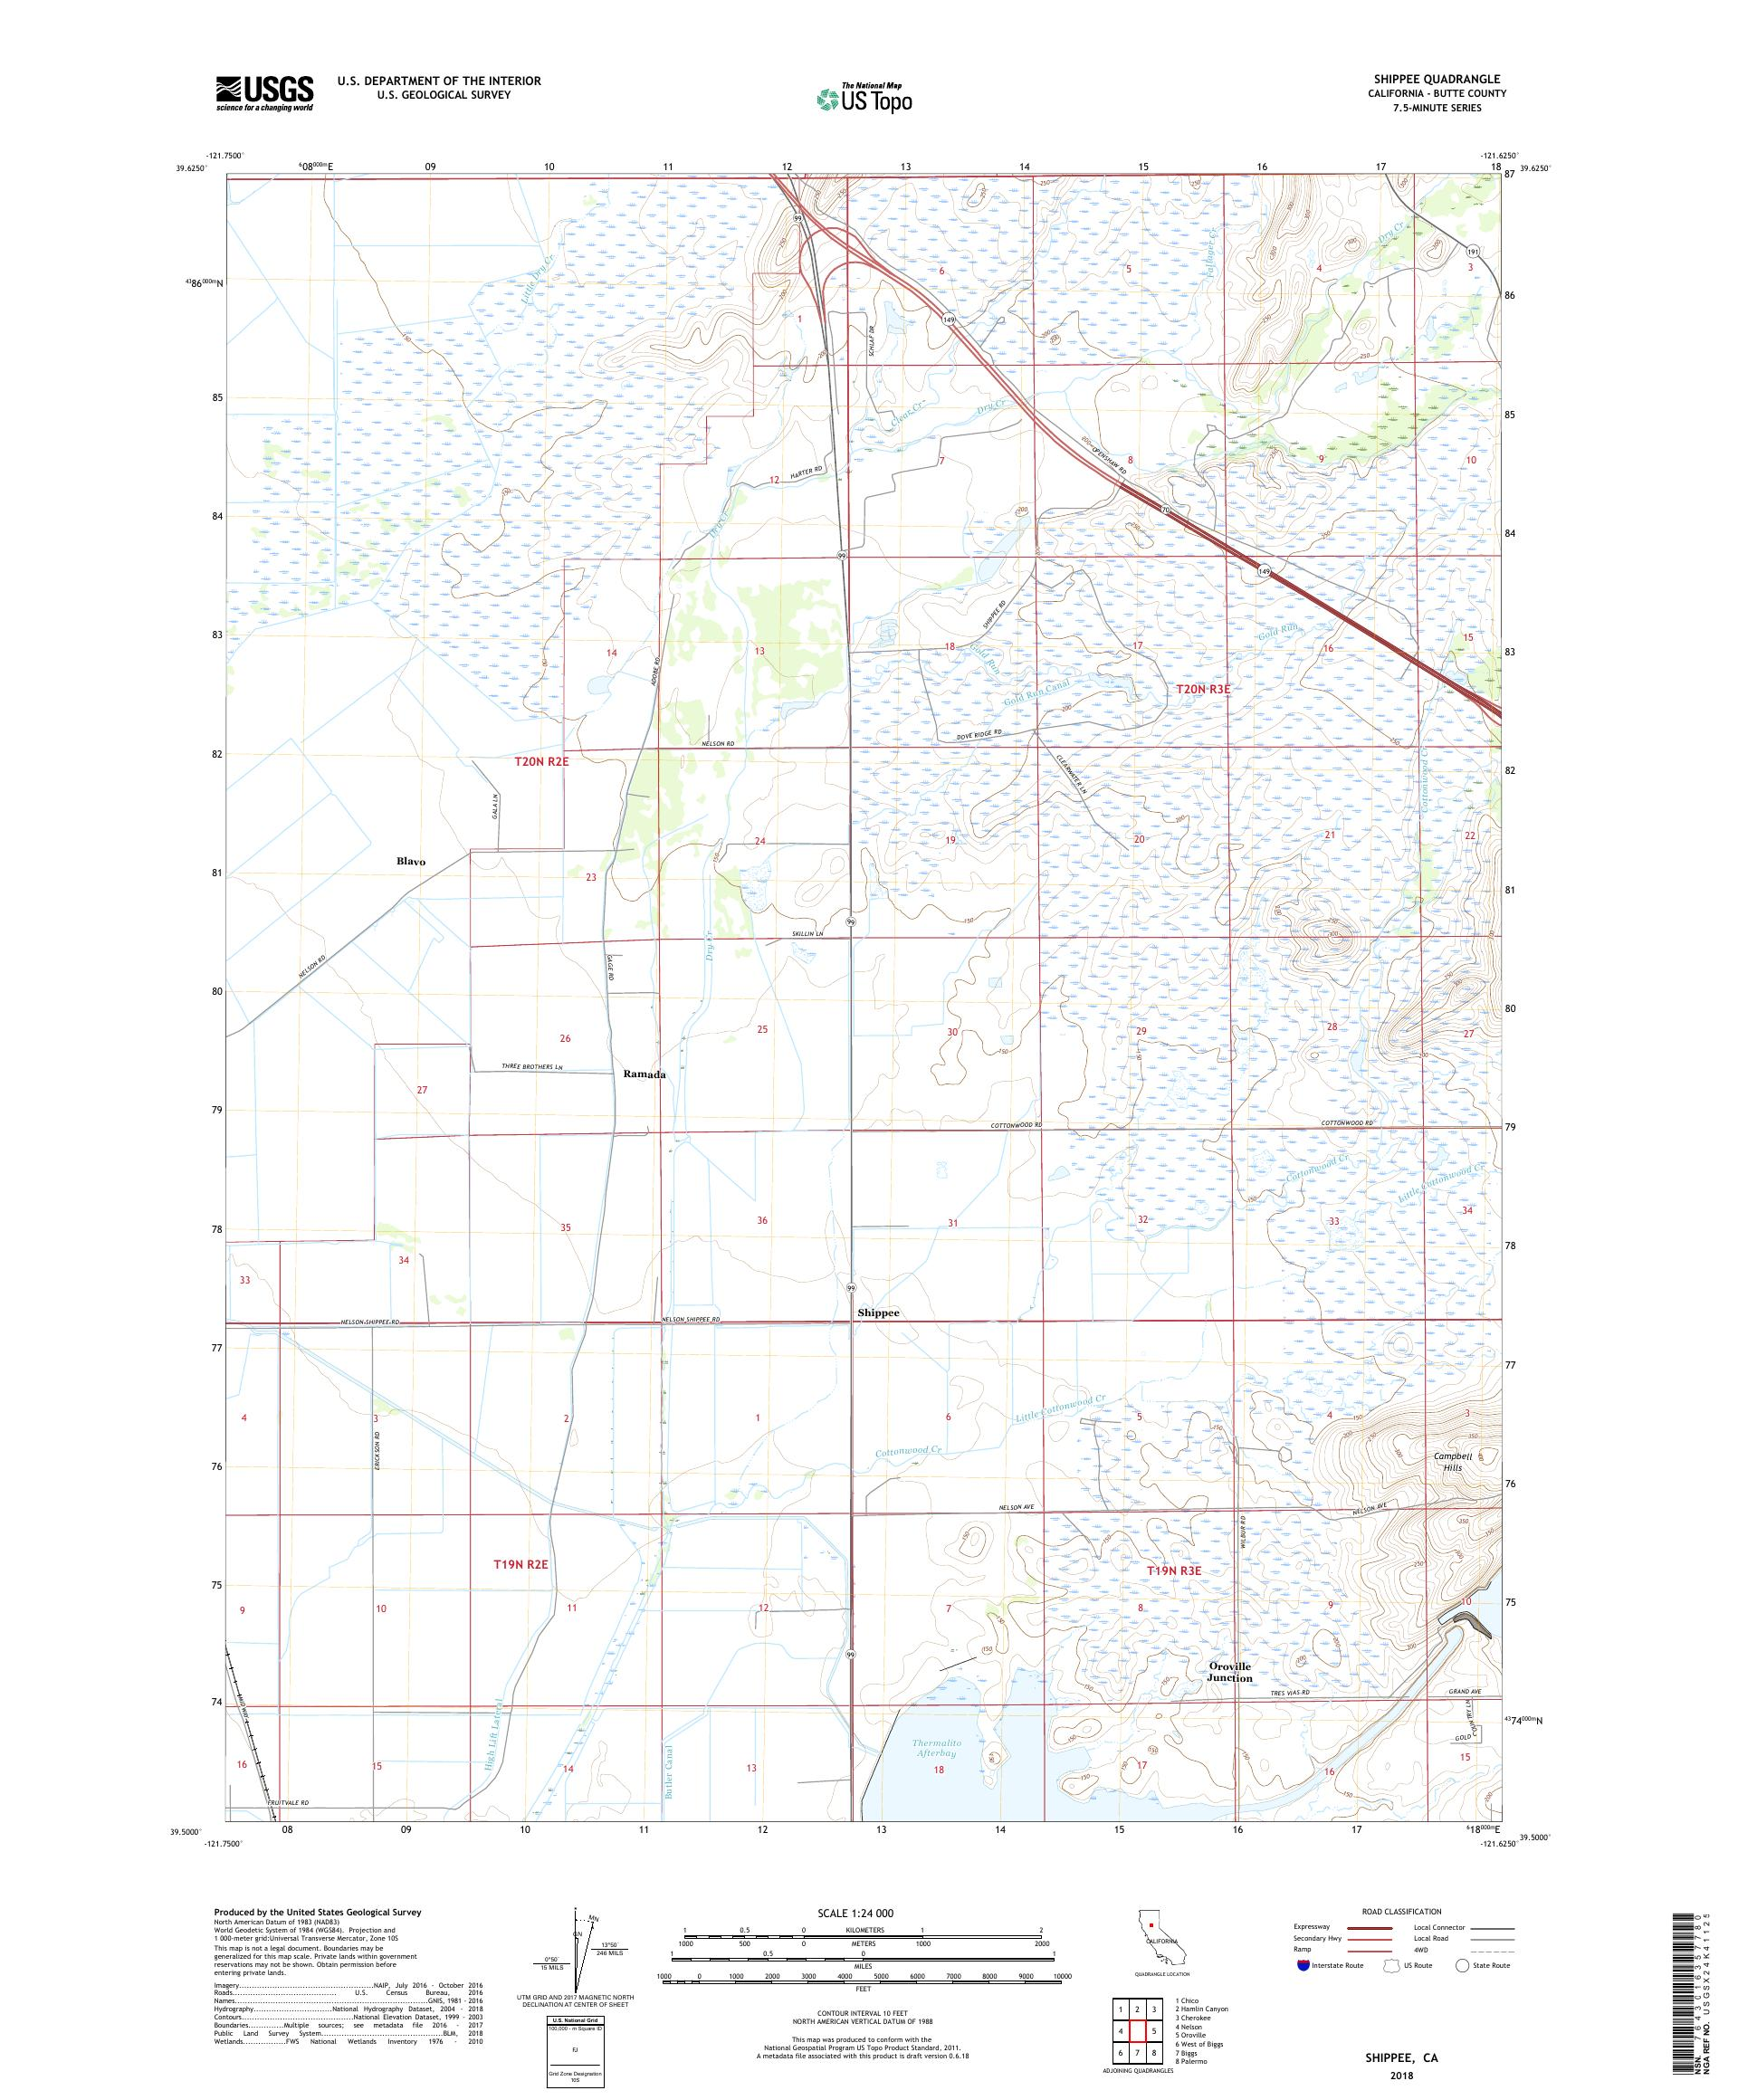 MyTopo Shippee, California USGS Quad Topo Map